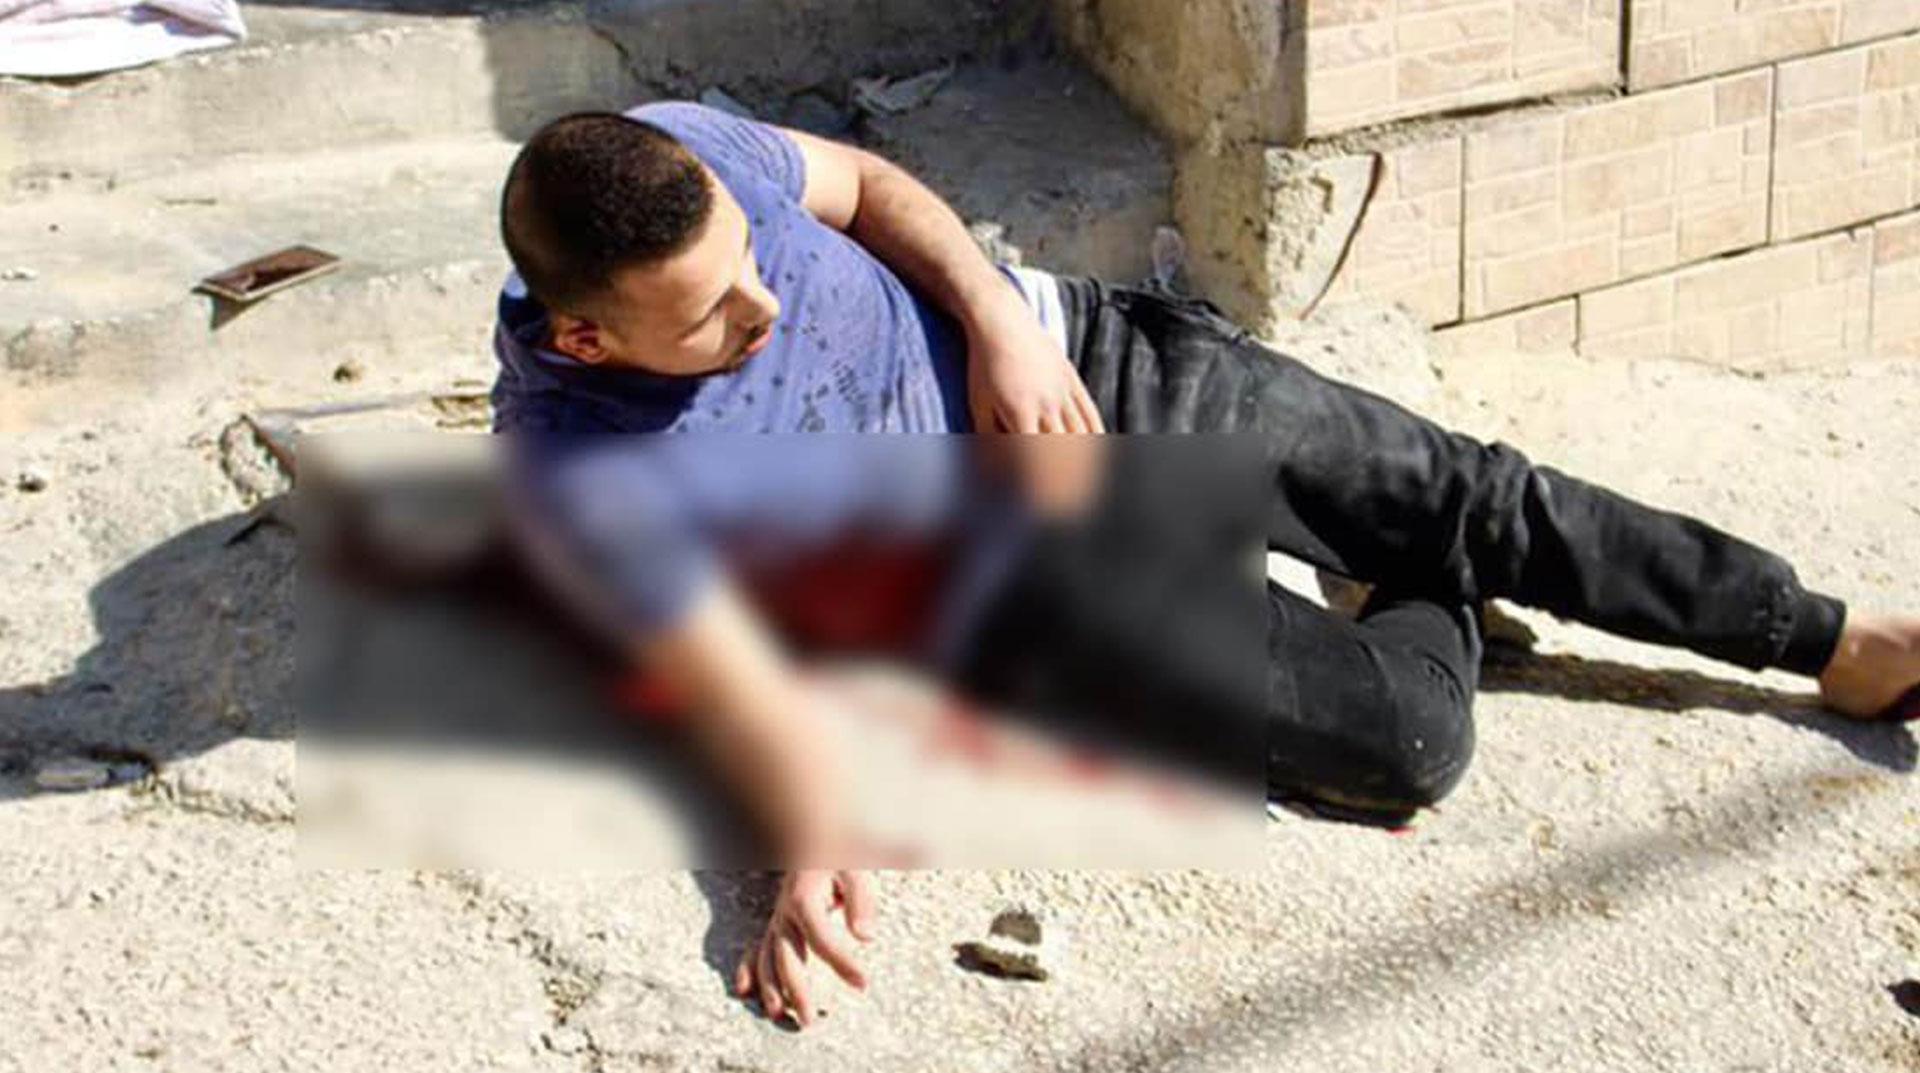 İşgalci İsrail Filistinli Genci Şehit Etti